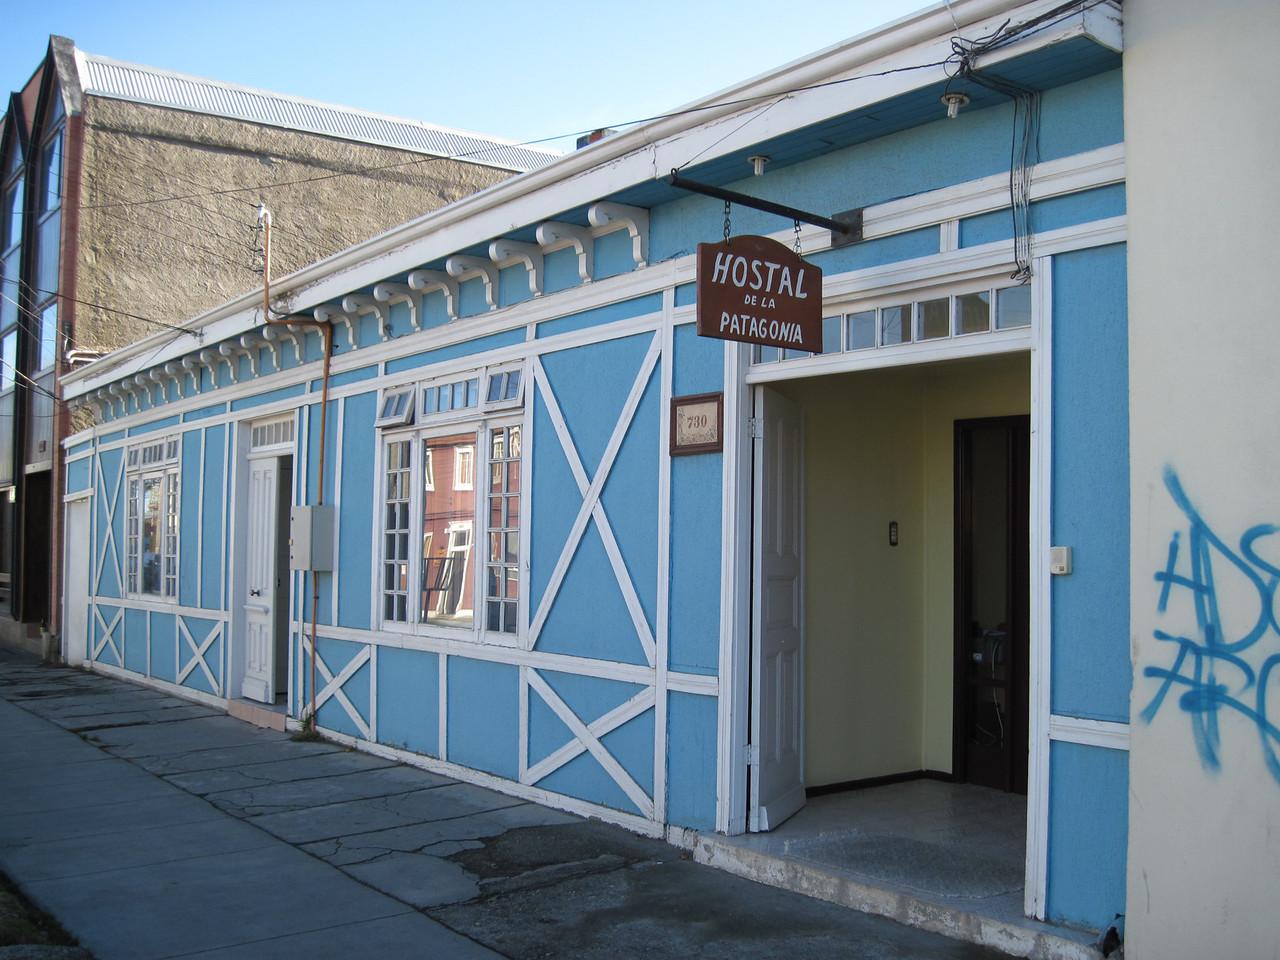 Hostal De La Patagonia